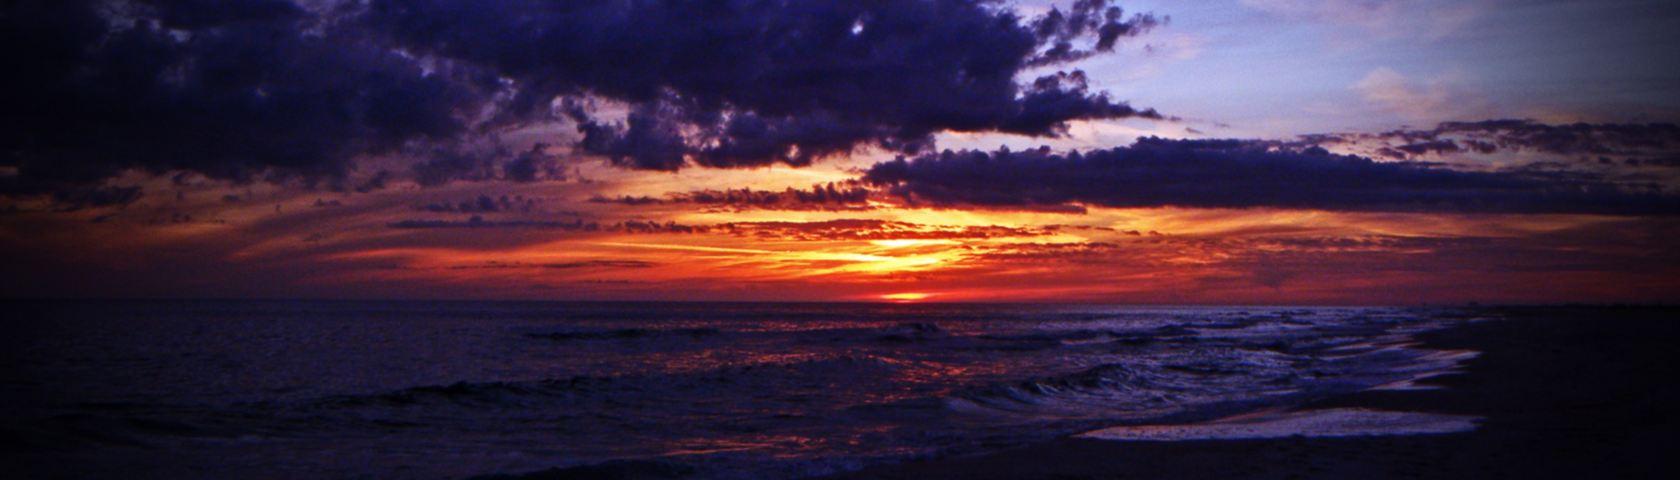 Sunset over Florida